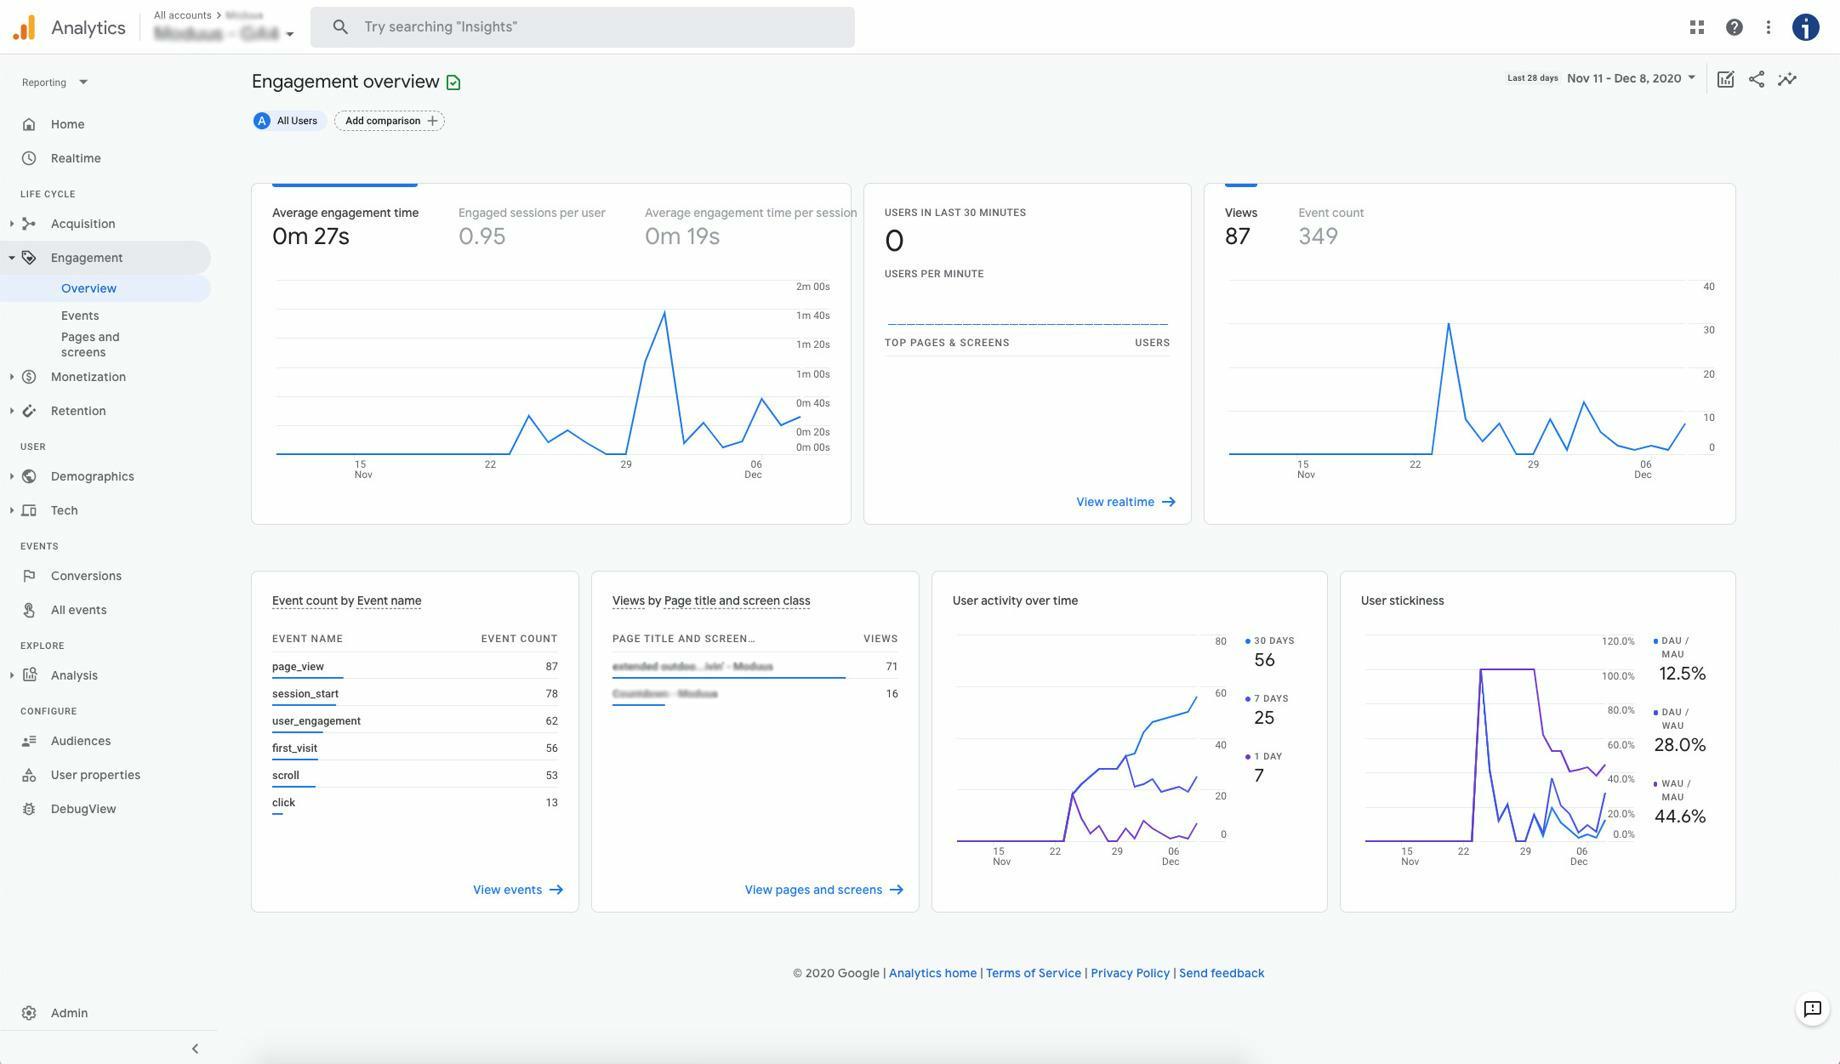 Google Analytics 4 engagement interface